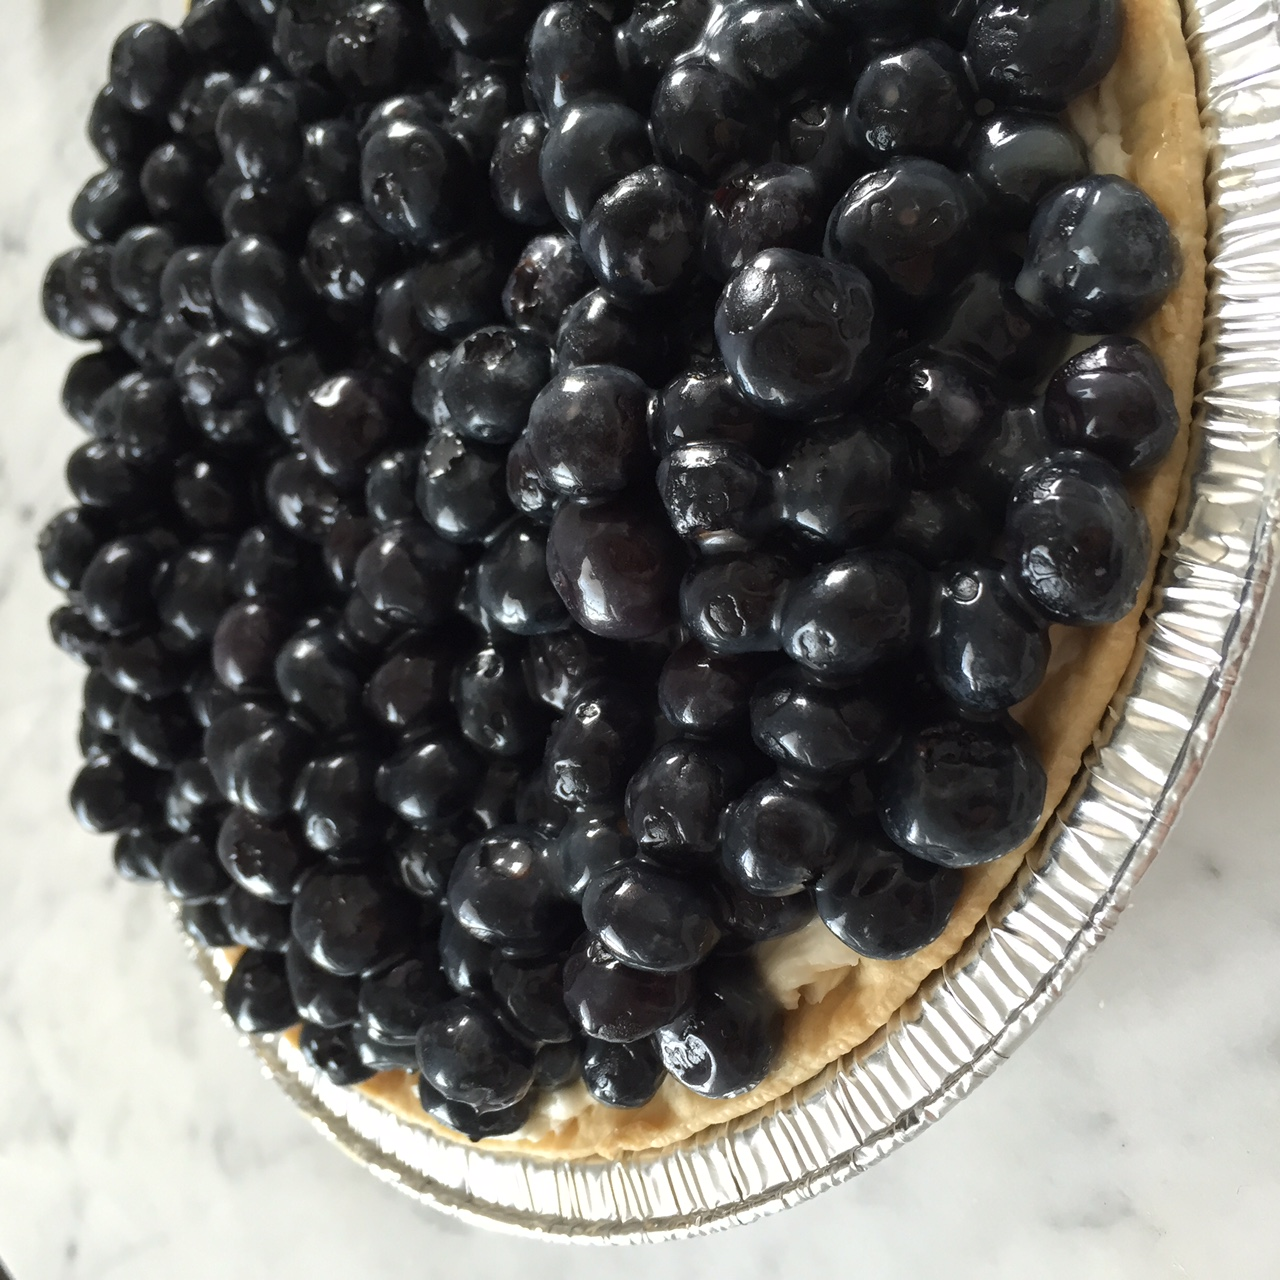 Blueberry Mascarpone Tart. Easiest dessert ever.  Photo: The Vancouverite